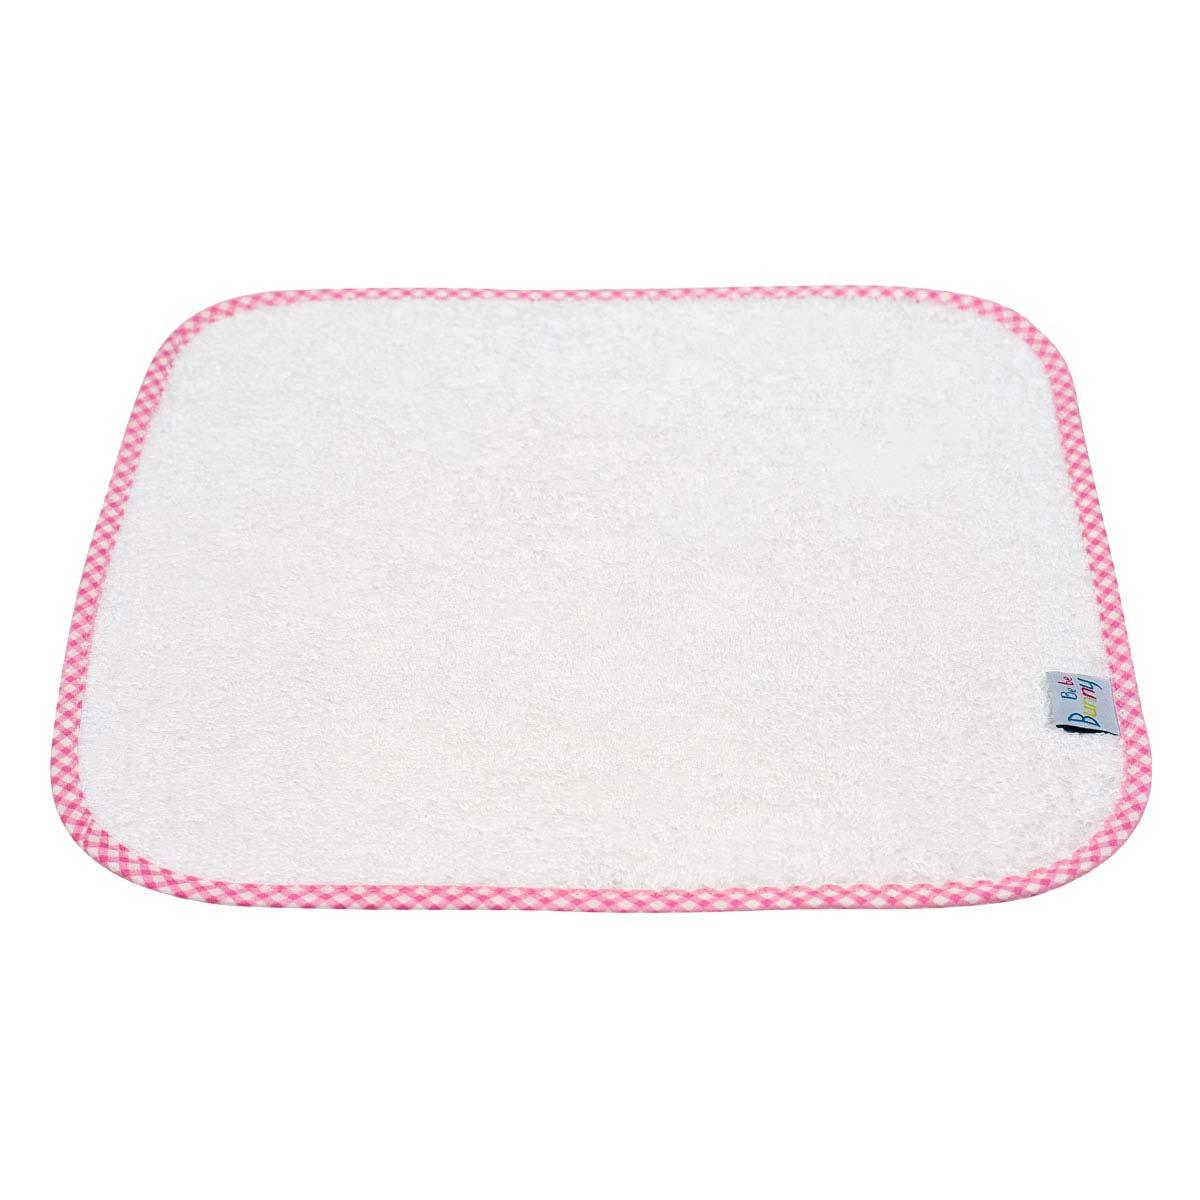 Bunny bebe λαβέτα πετσετέ με ρέλι ροζ καρό